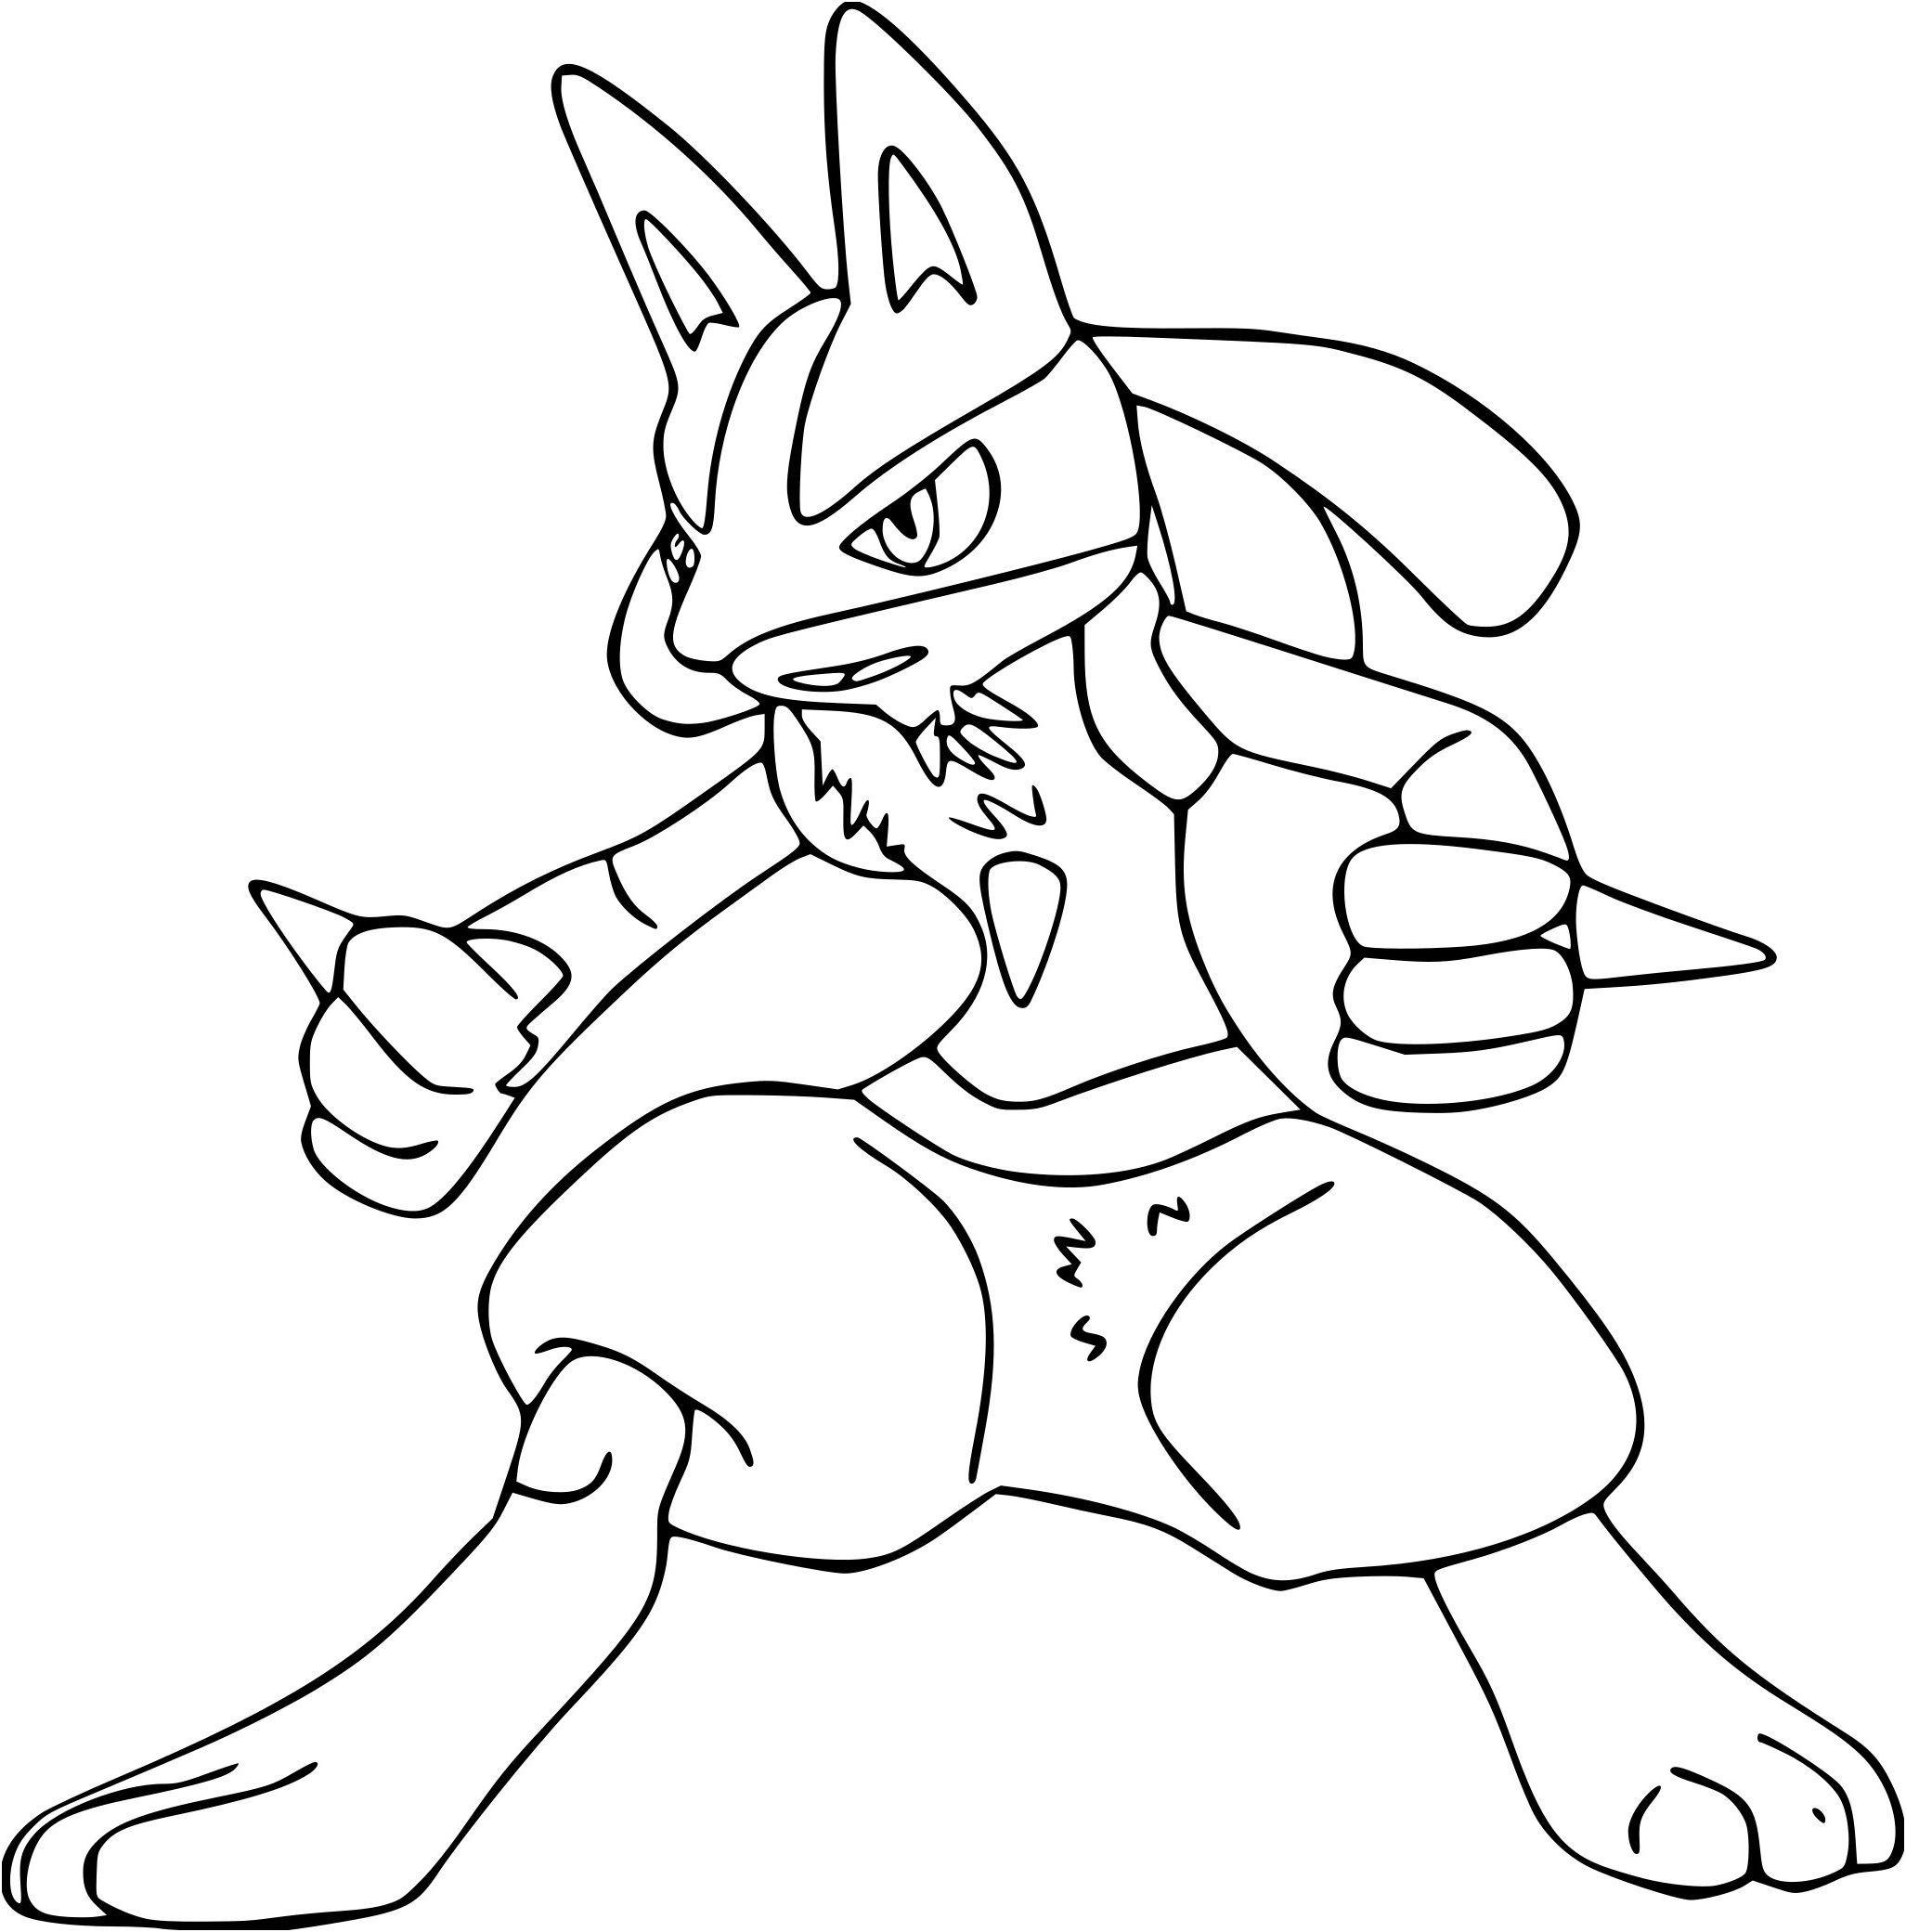 Coloriage Pokemon Avec Modele